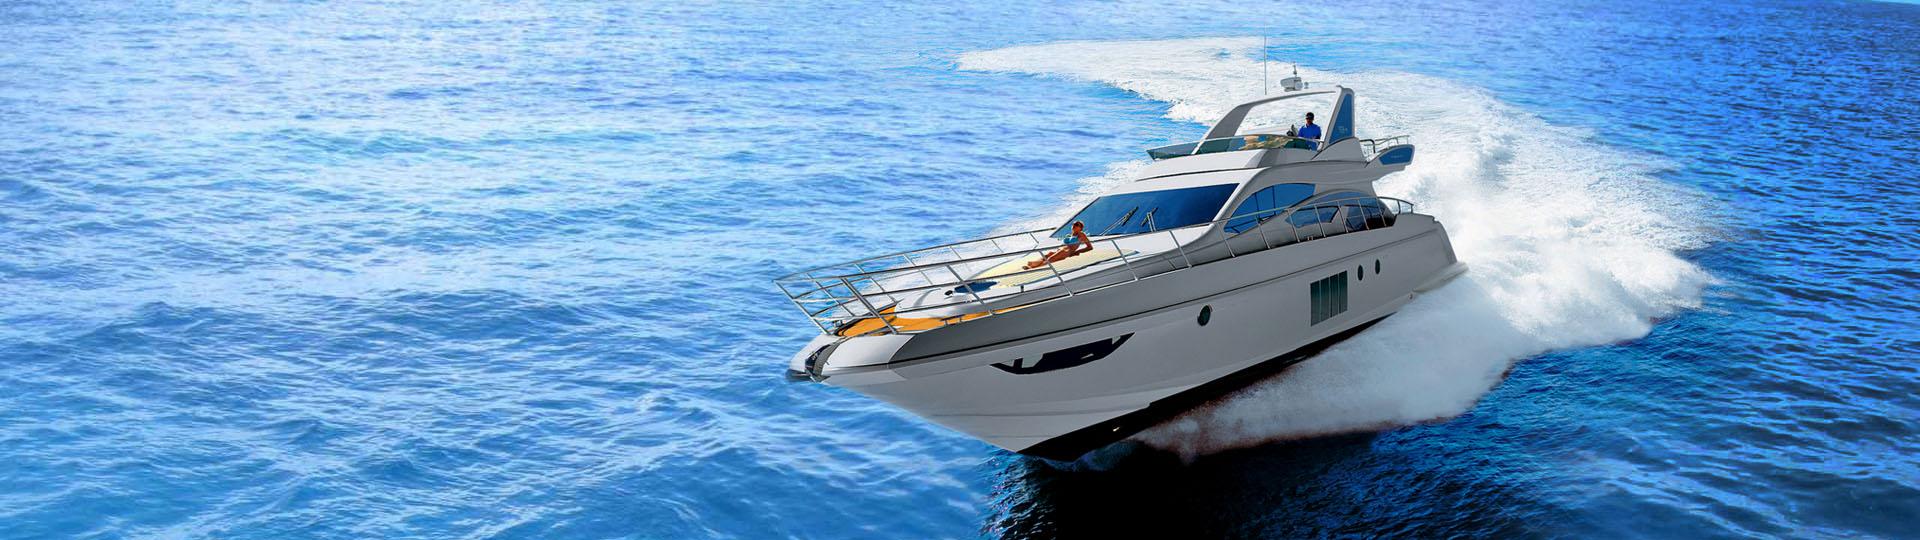 Peças em acrilico para barcos yachts industria nautica joinville sc